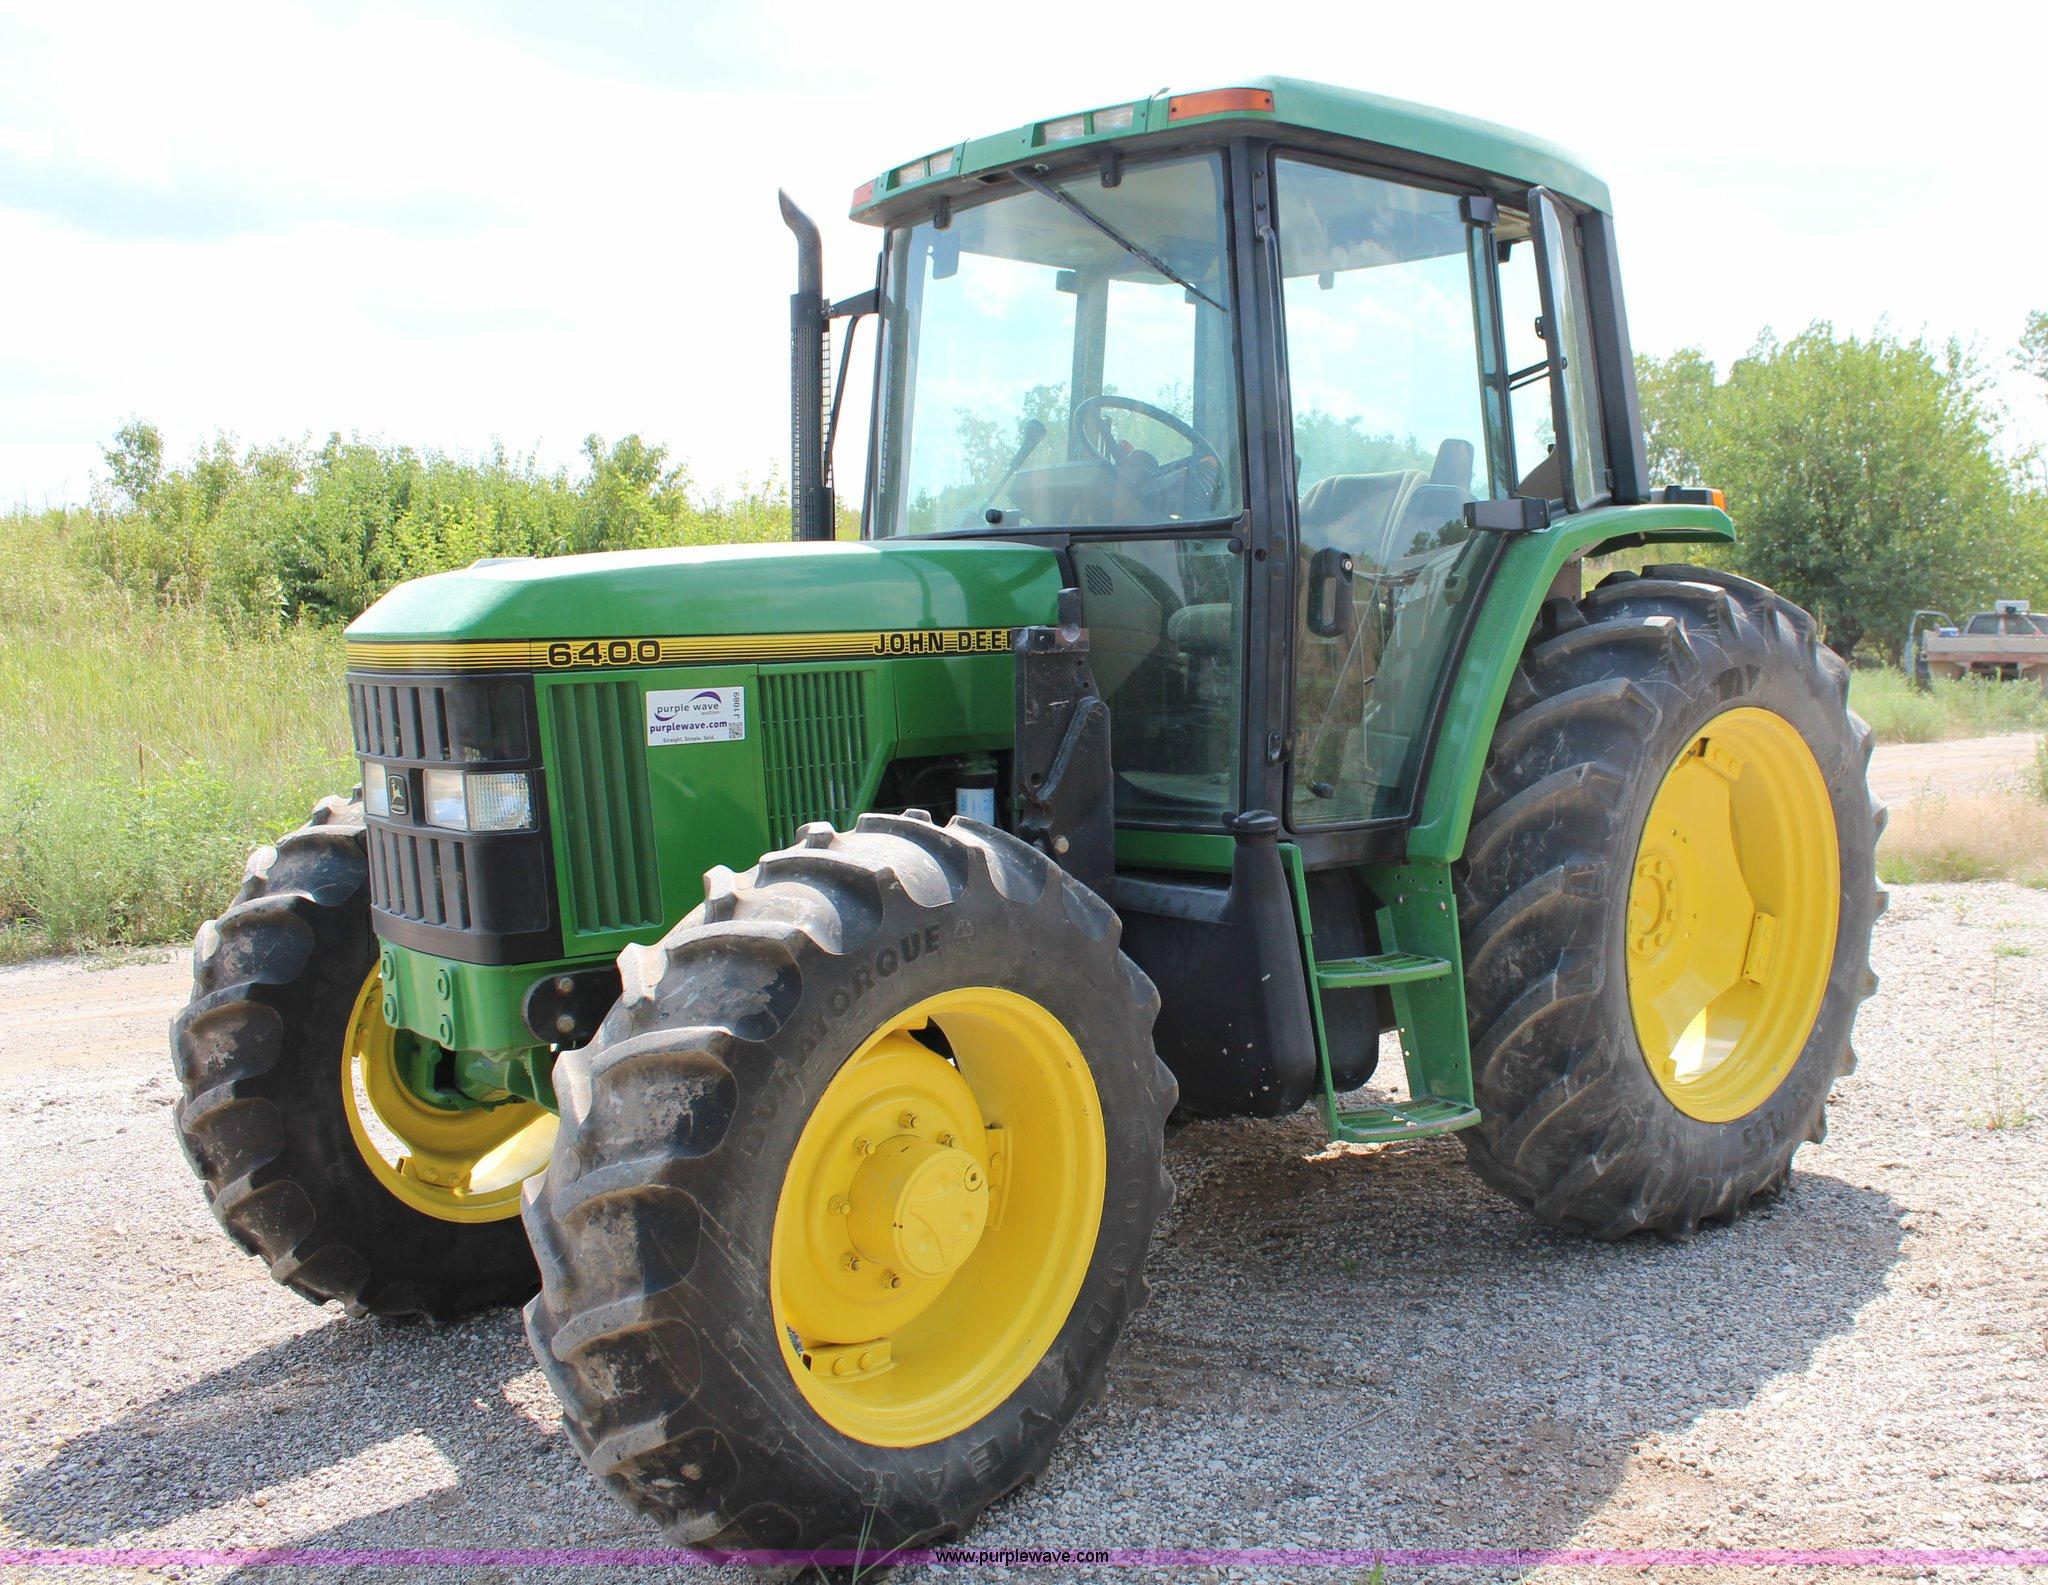 J1089 1997 john deere 6400 mfwd tractor item j1089 sold! augus